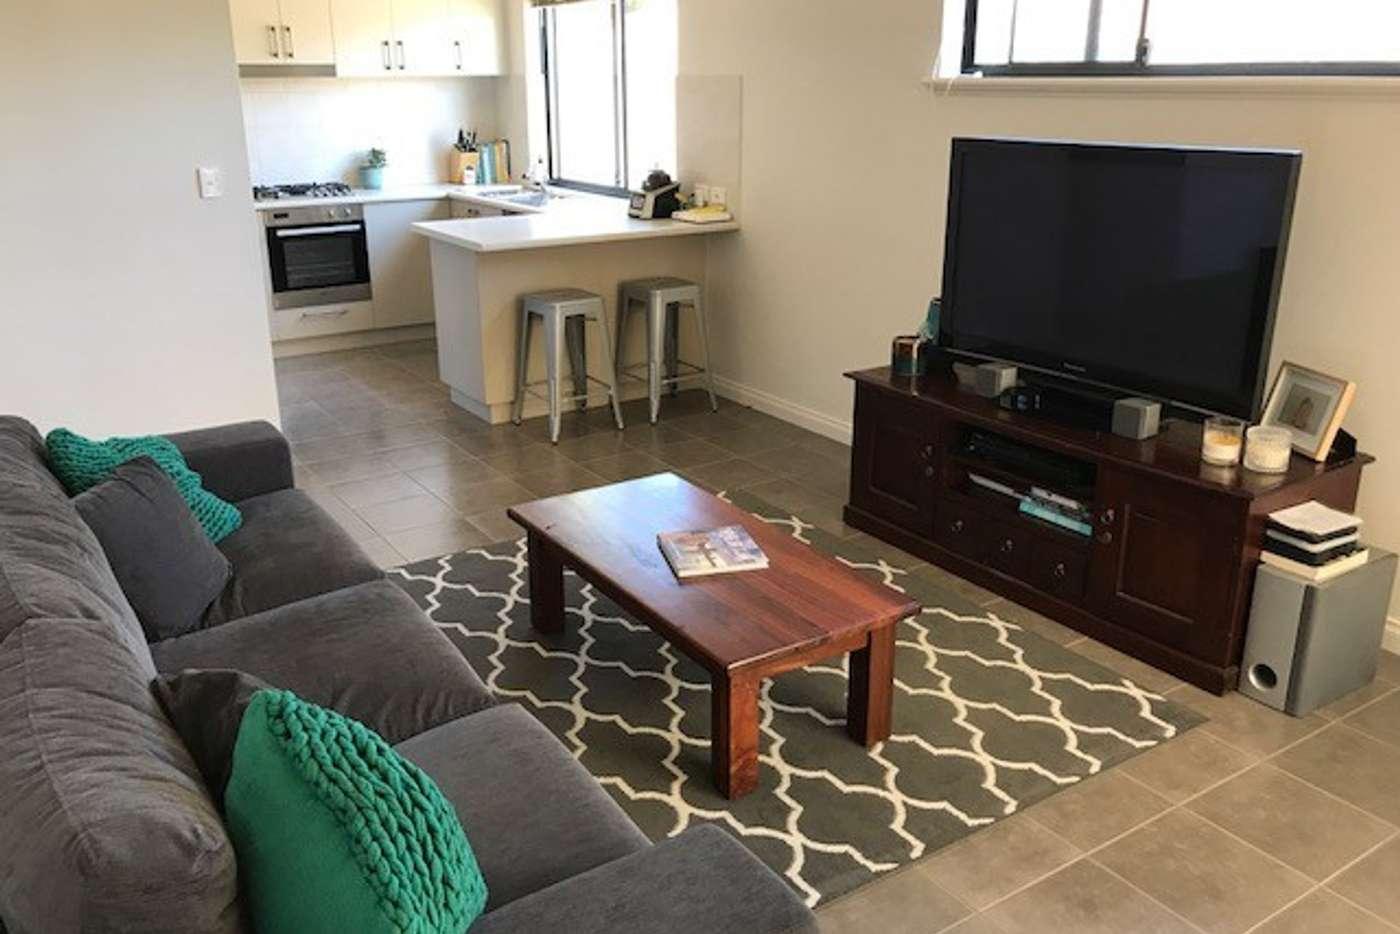 Main view of Homely villa listing, 110C Beatrice Street, Innaloo WA 6018